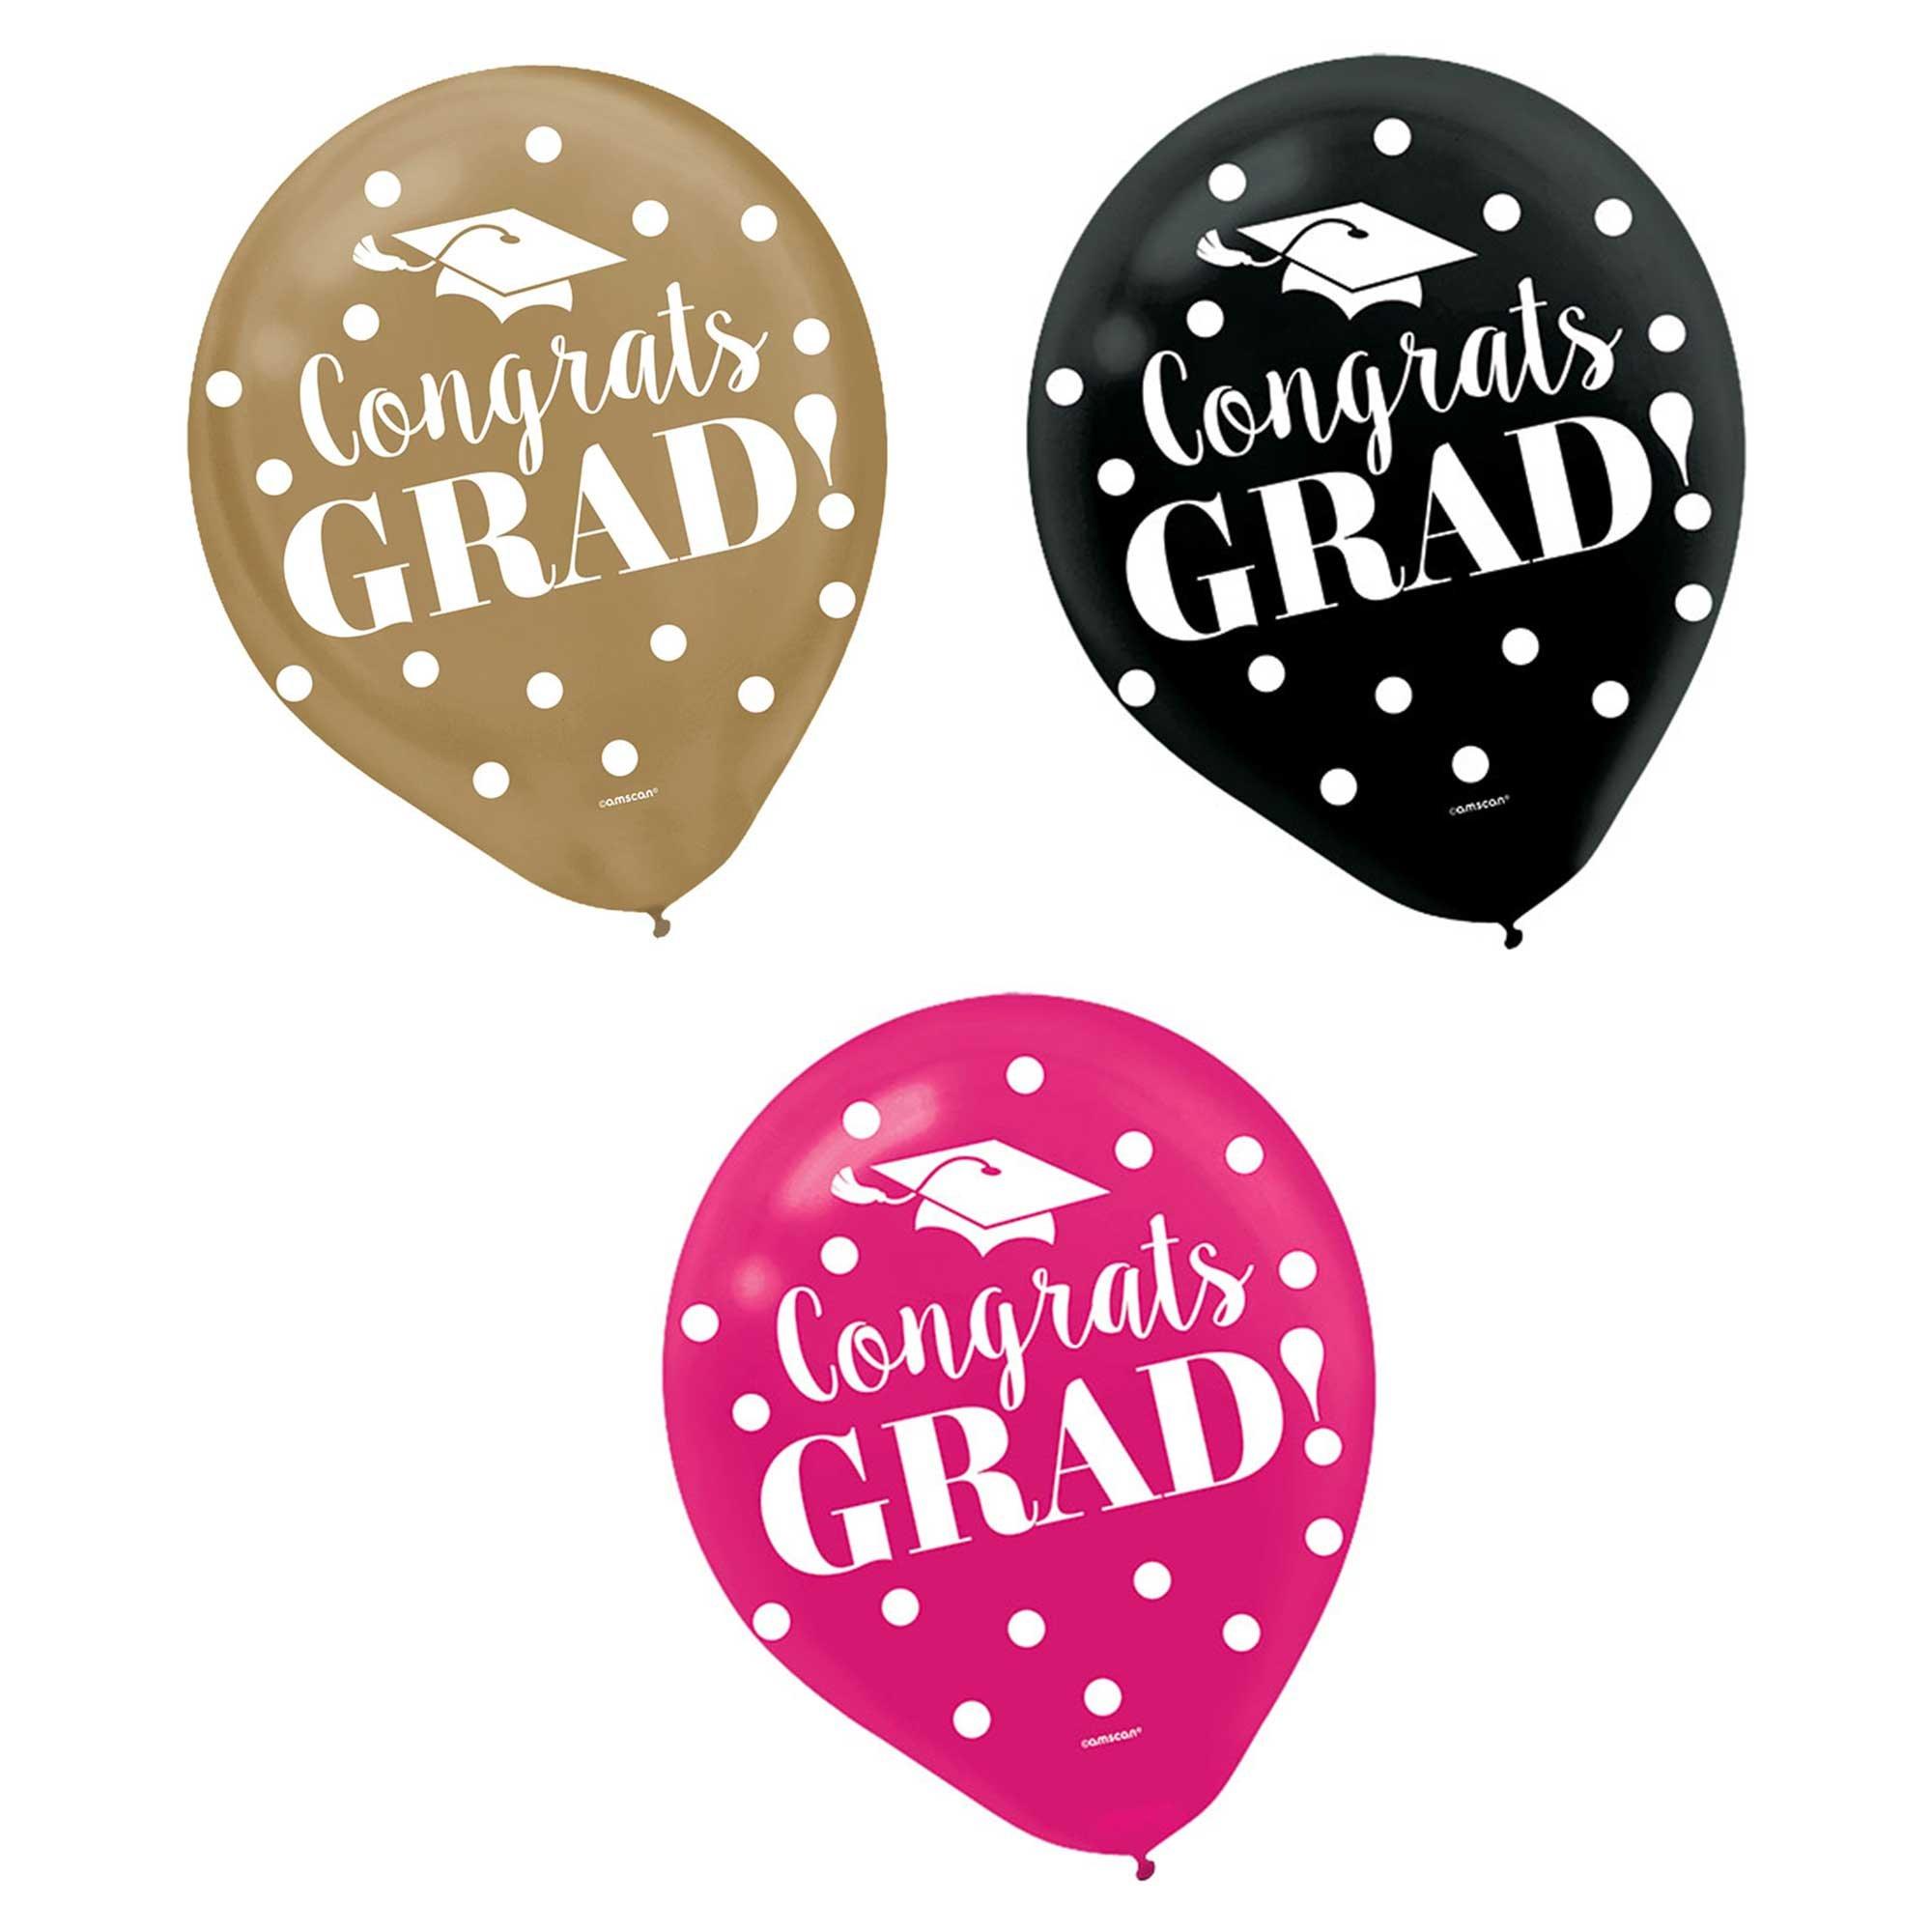 """Congrats Grad Confetti 12"""" / 30cm Latex Balloons Assorted Colours"